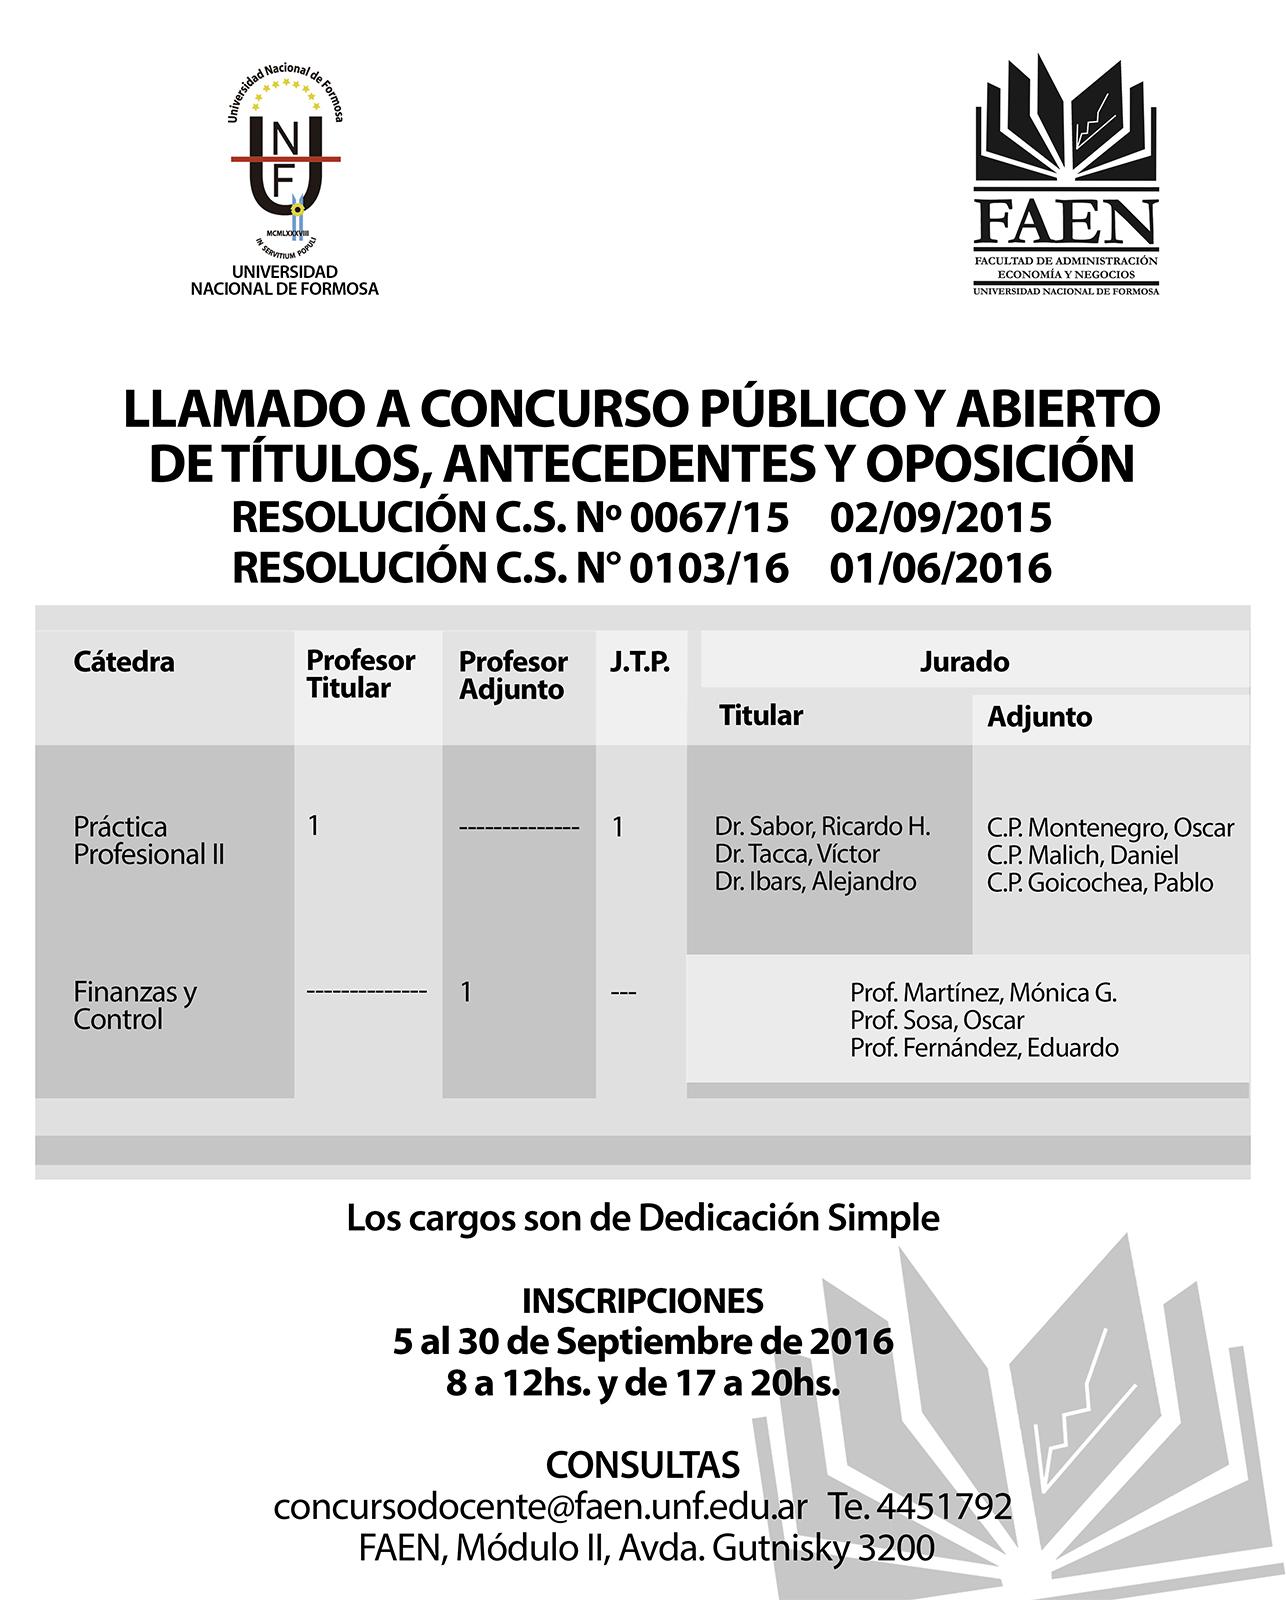 Llamado concurso docente faen resol c s 103 16 for Concurso docentes exterior